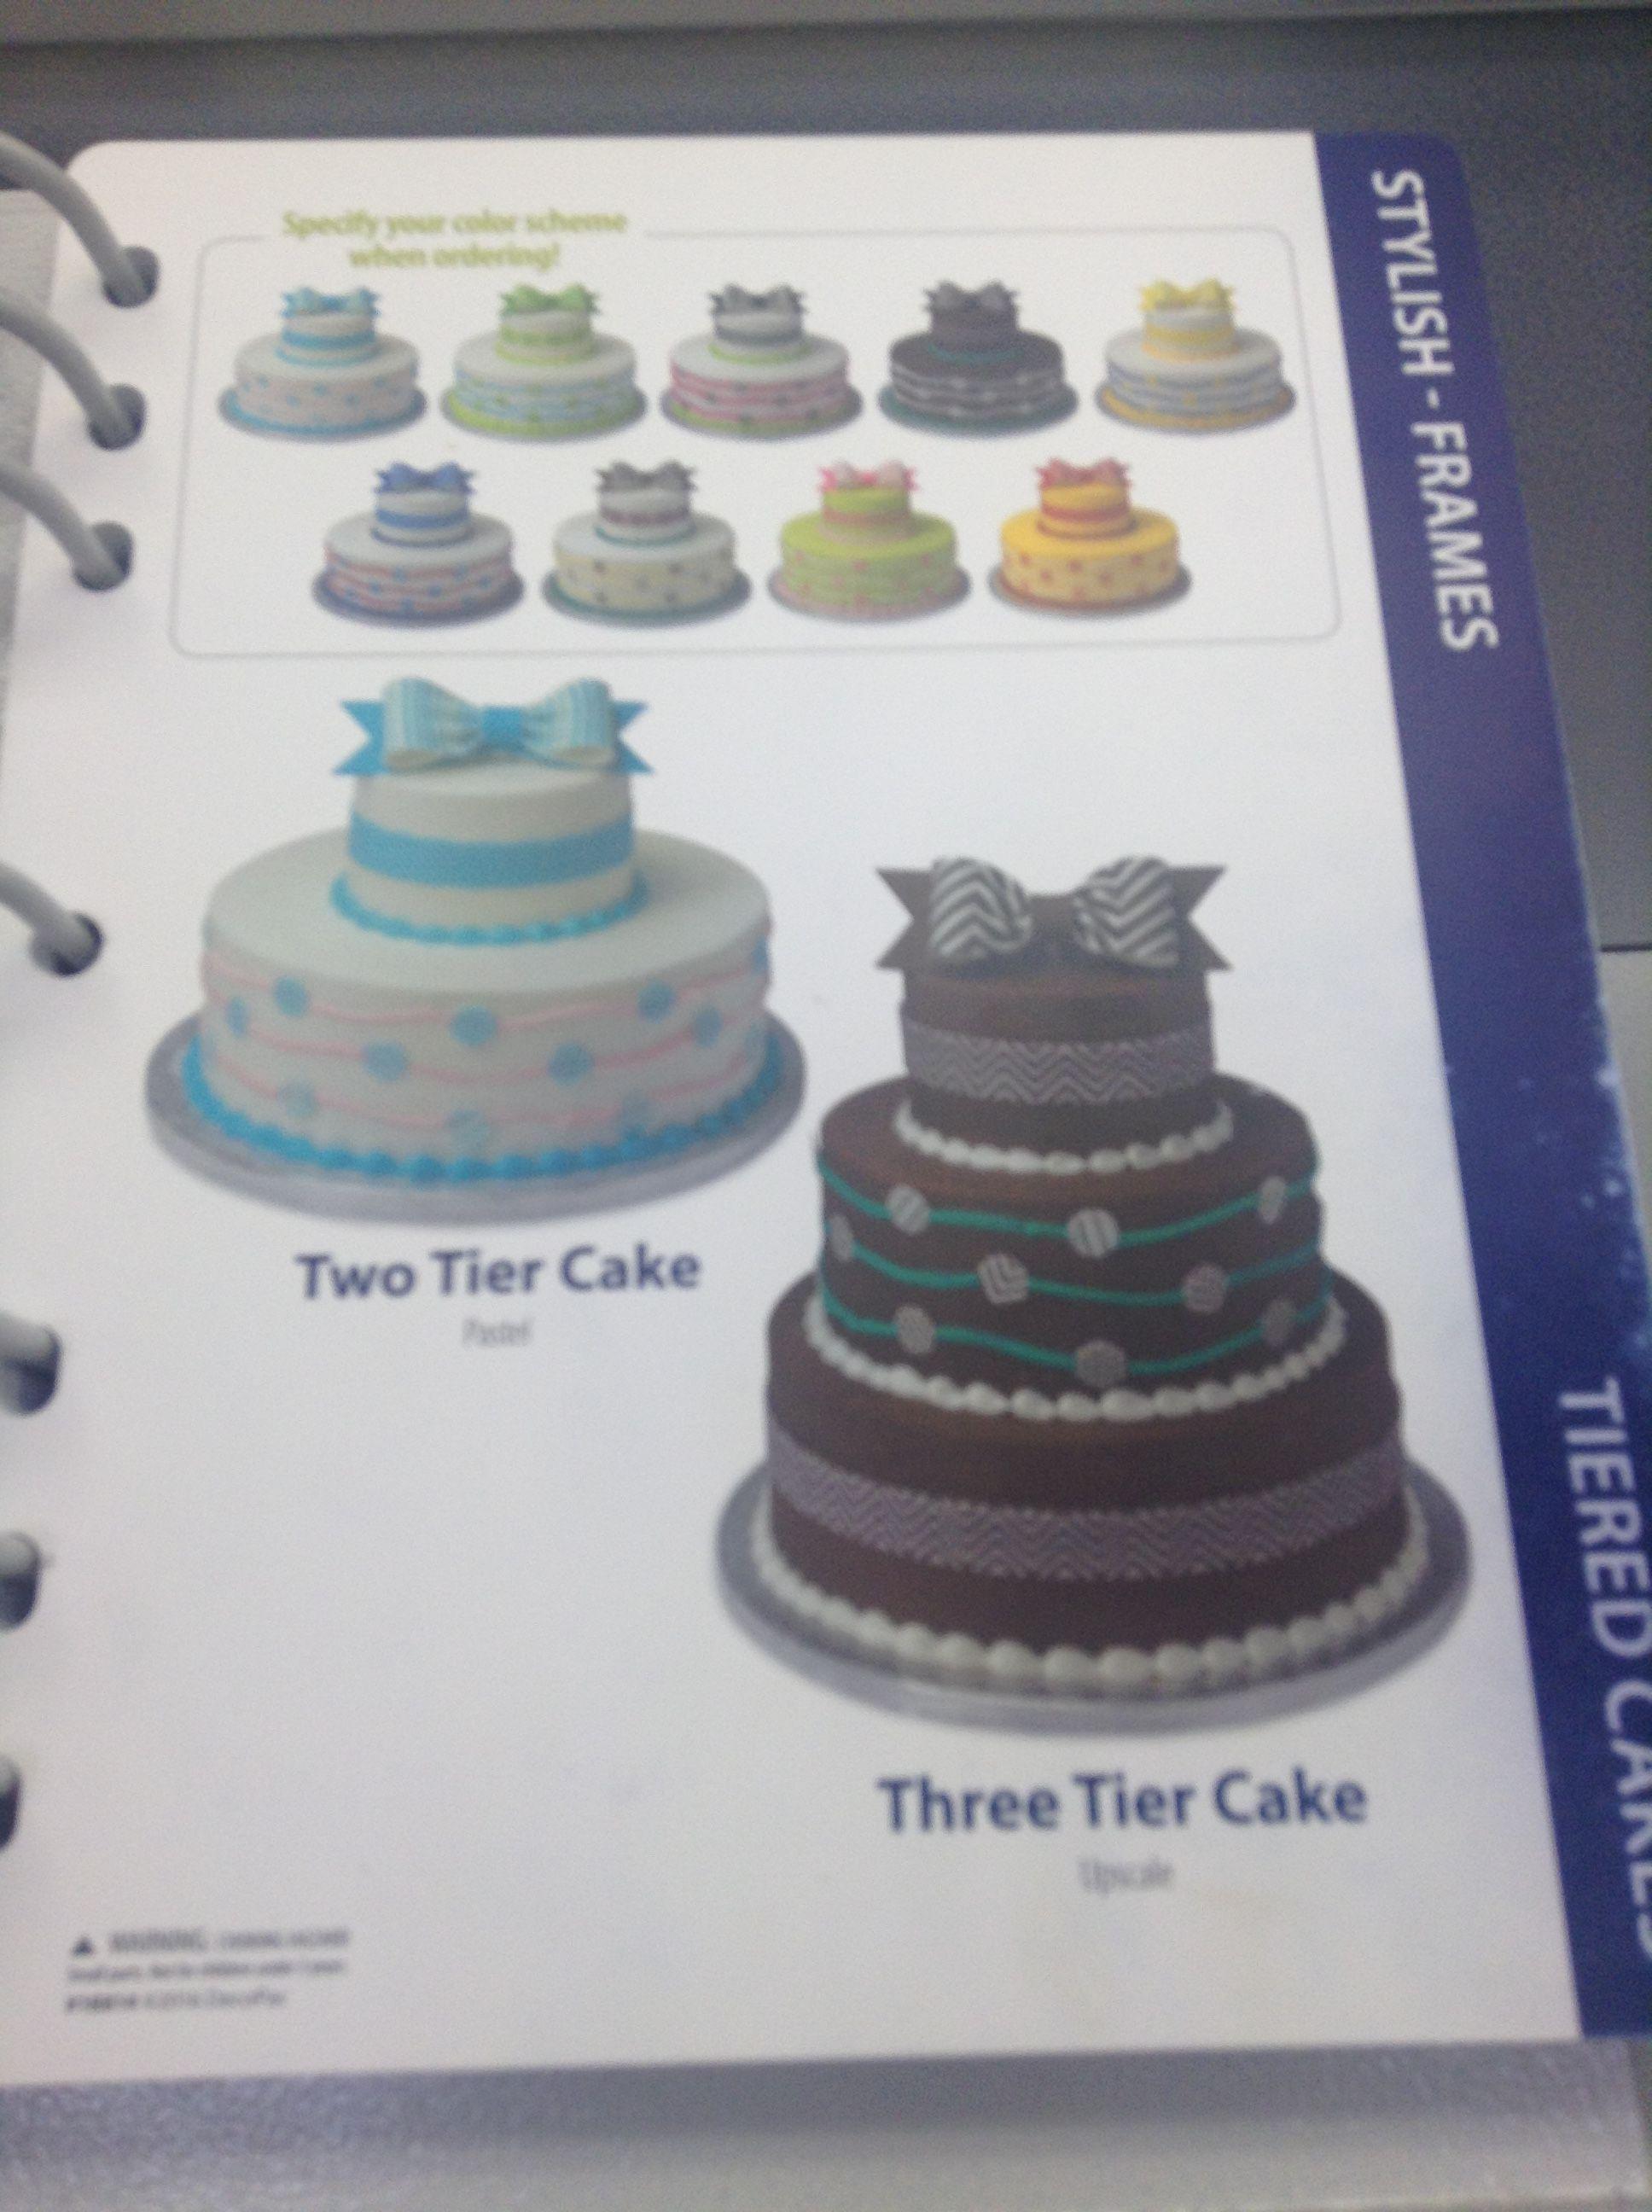 This Cake Is Sooooo Adorable I Took A Pic Of Sams Club Cake Book